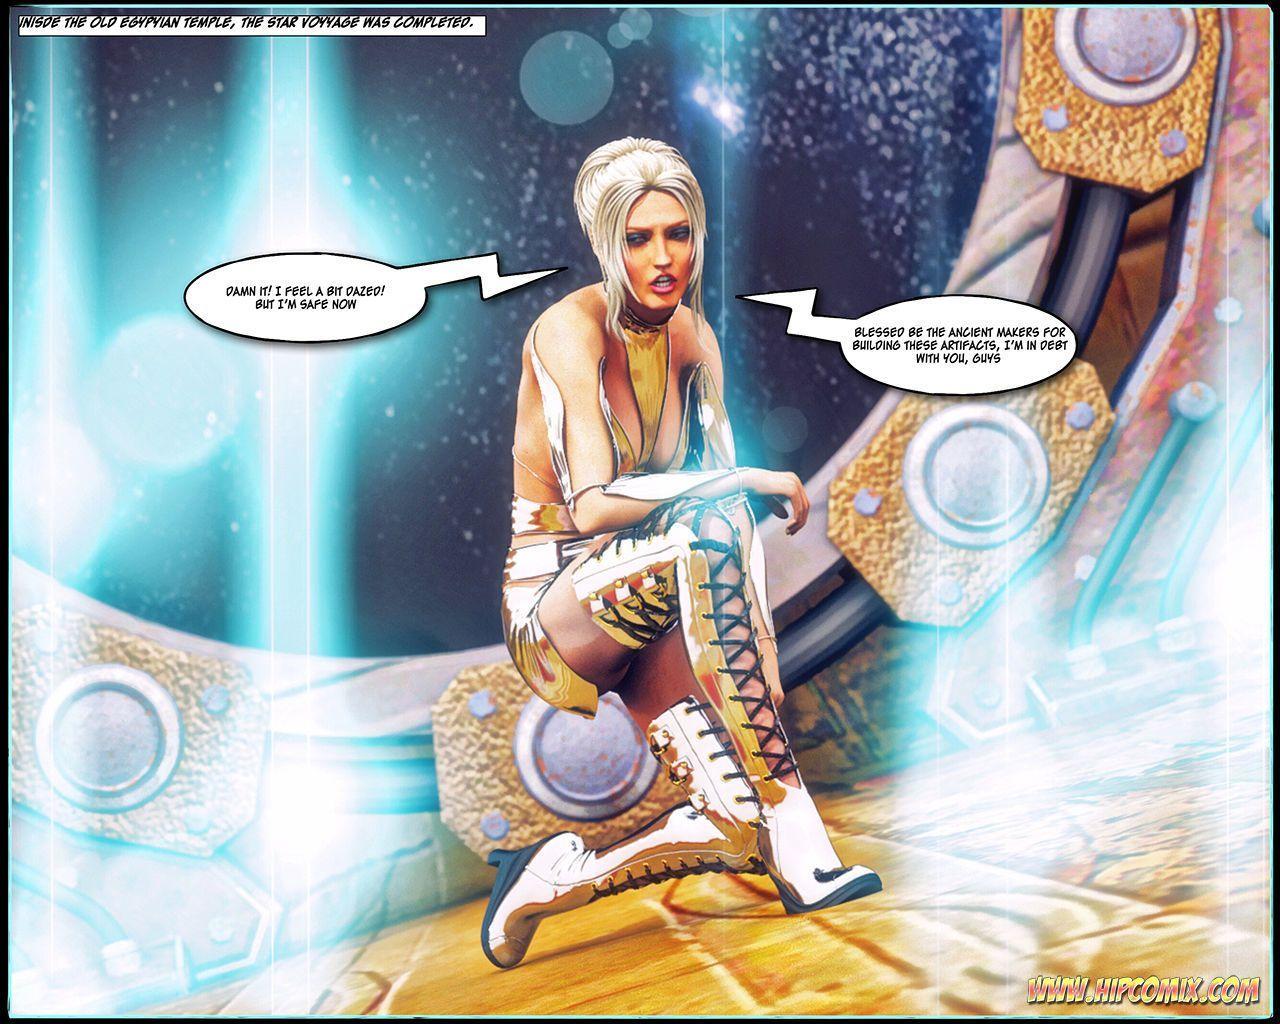 [Mitru] Hip Girl - Captive of Guul 1-8 - part 2